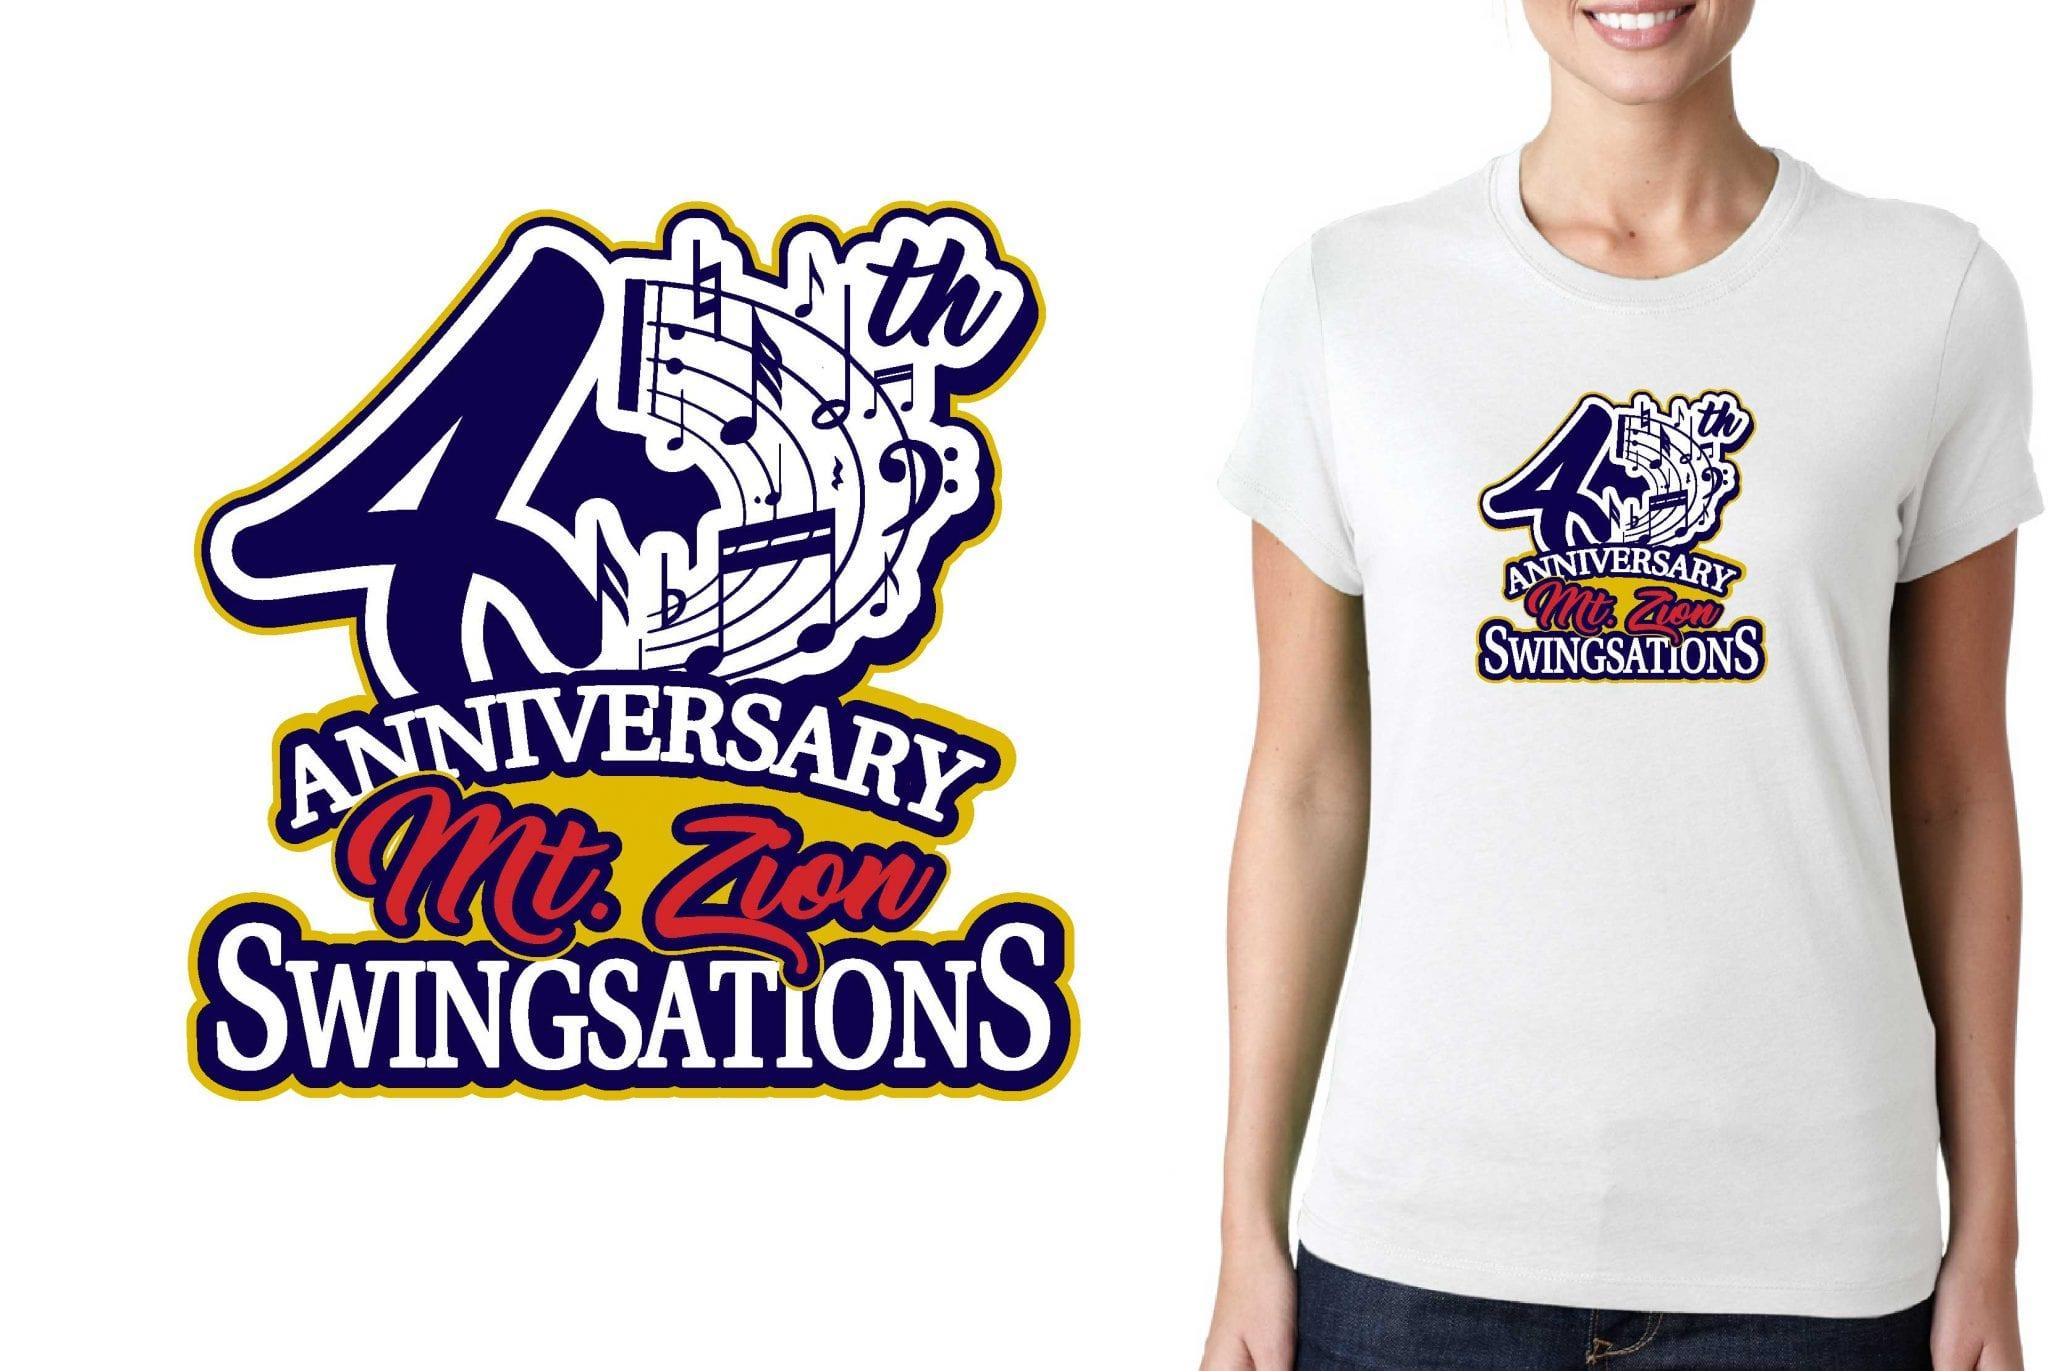 2017 CUSTOM ARTWORK FORM Mt Zion Swingsations vector logo design for t-shirt UrArtStudio